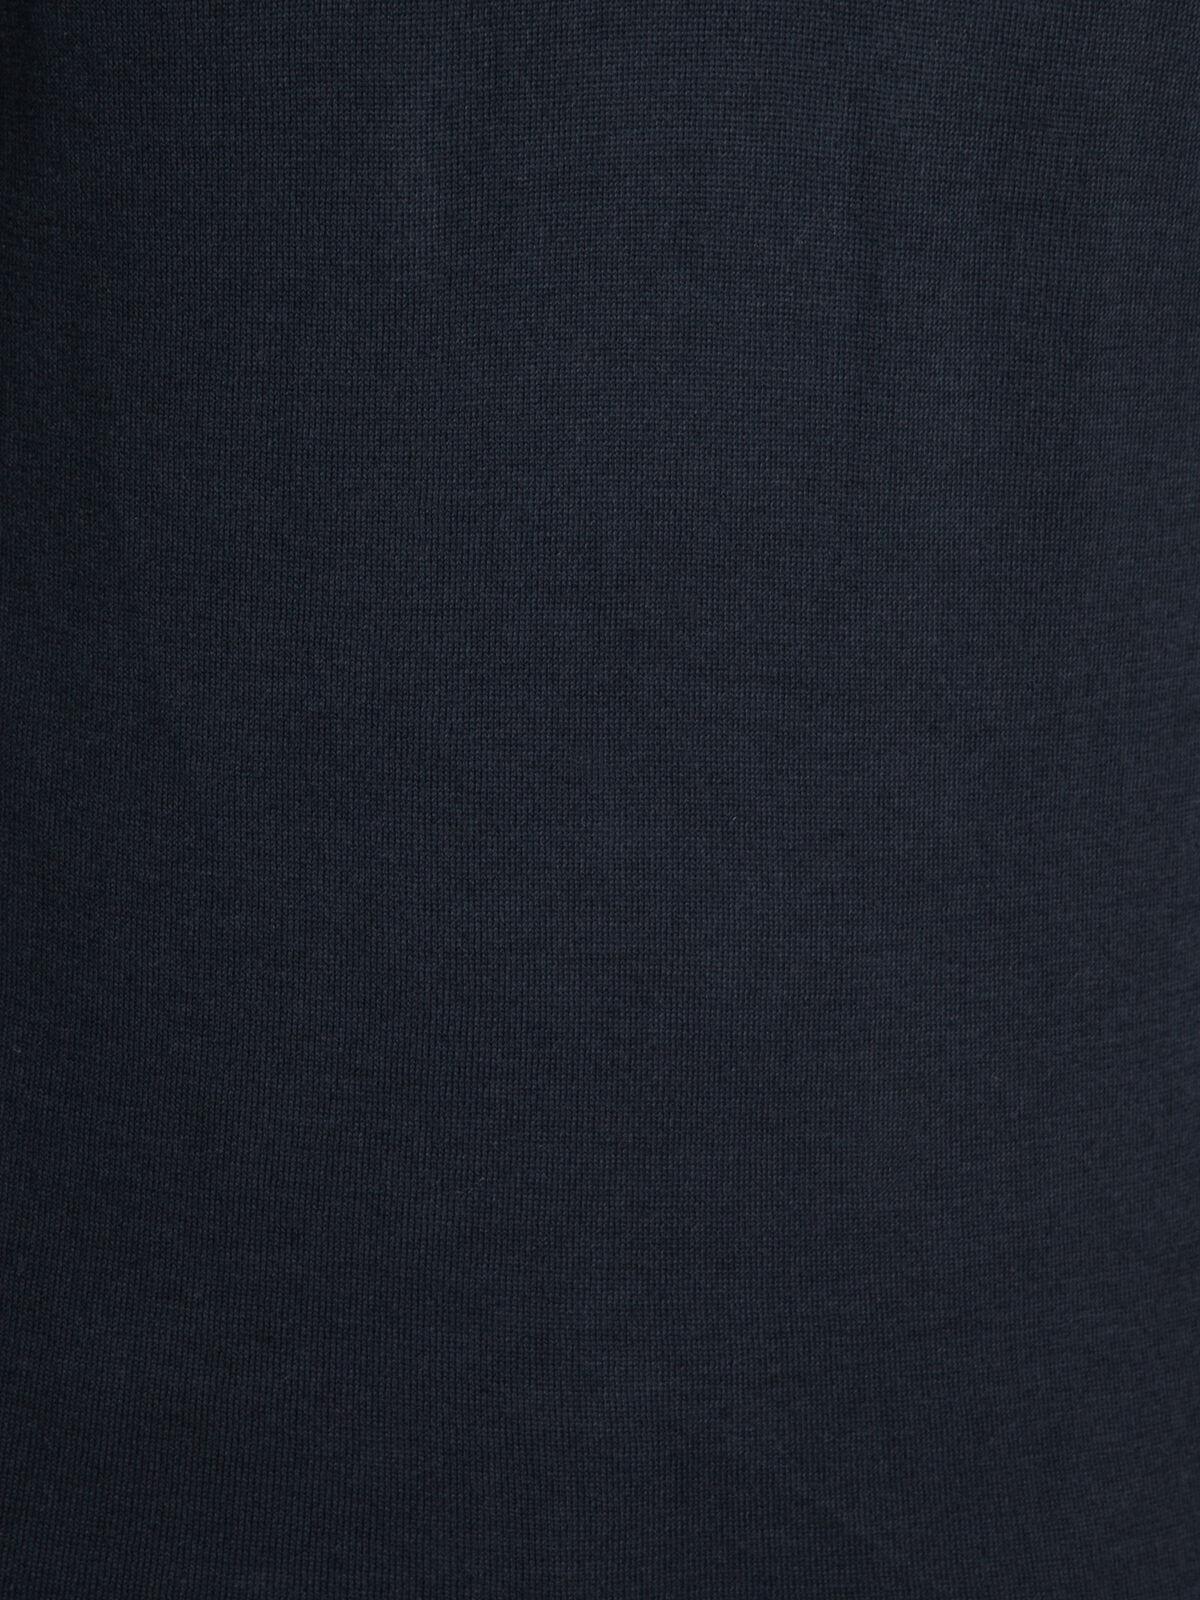 Mexx Pullover V Auschnitt navy | Dress for less